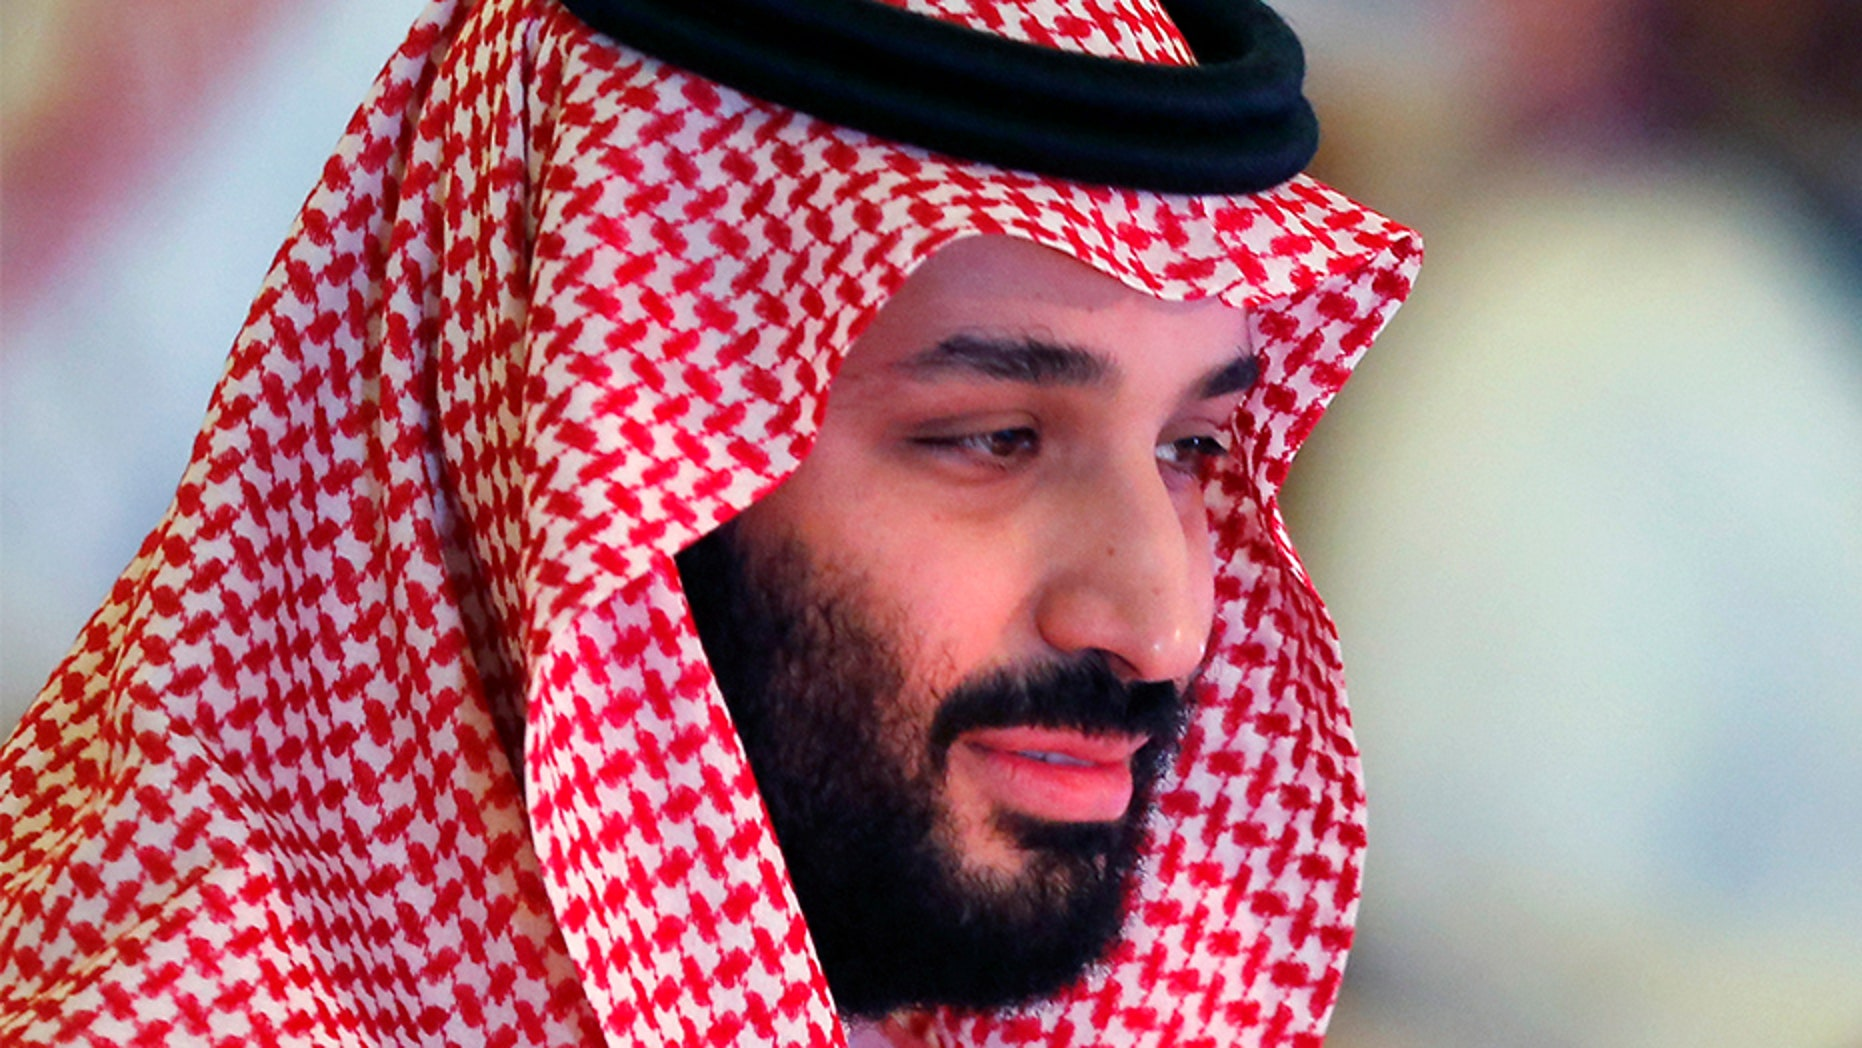 Saudi Crown Prince Mohammed bin Salman spoke Wednesday at the Future Investment Initiative conference, in Riyadh, Saudi Arabia.